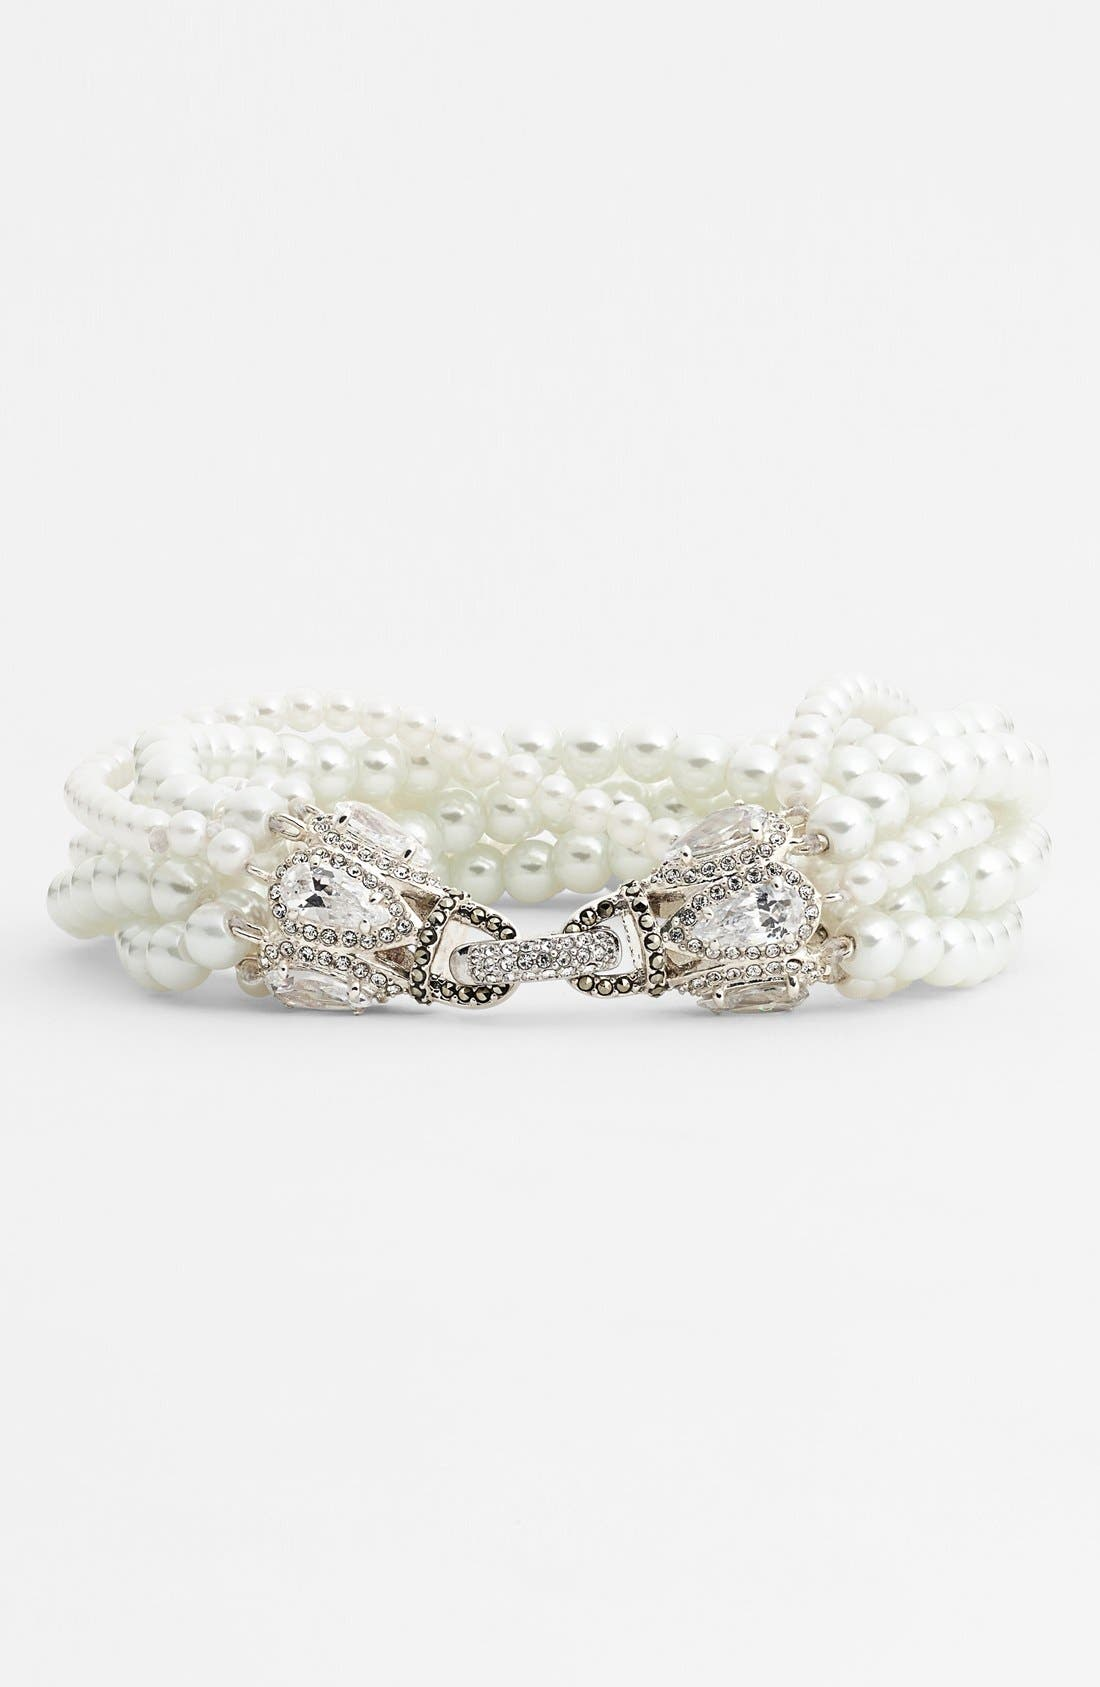 Alternate Image 1 Selected - Judith Jack 'Pearl Romance' Faux Pearl Bracelet